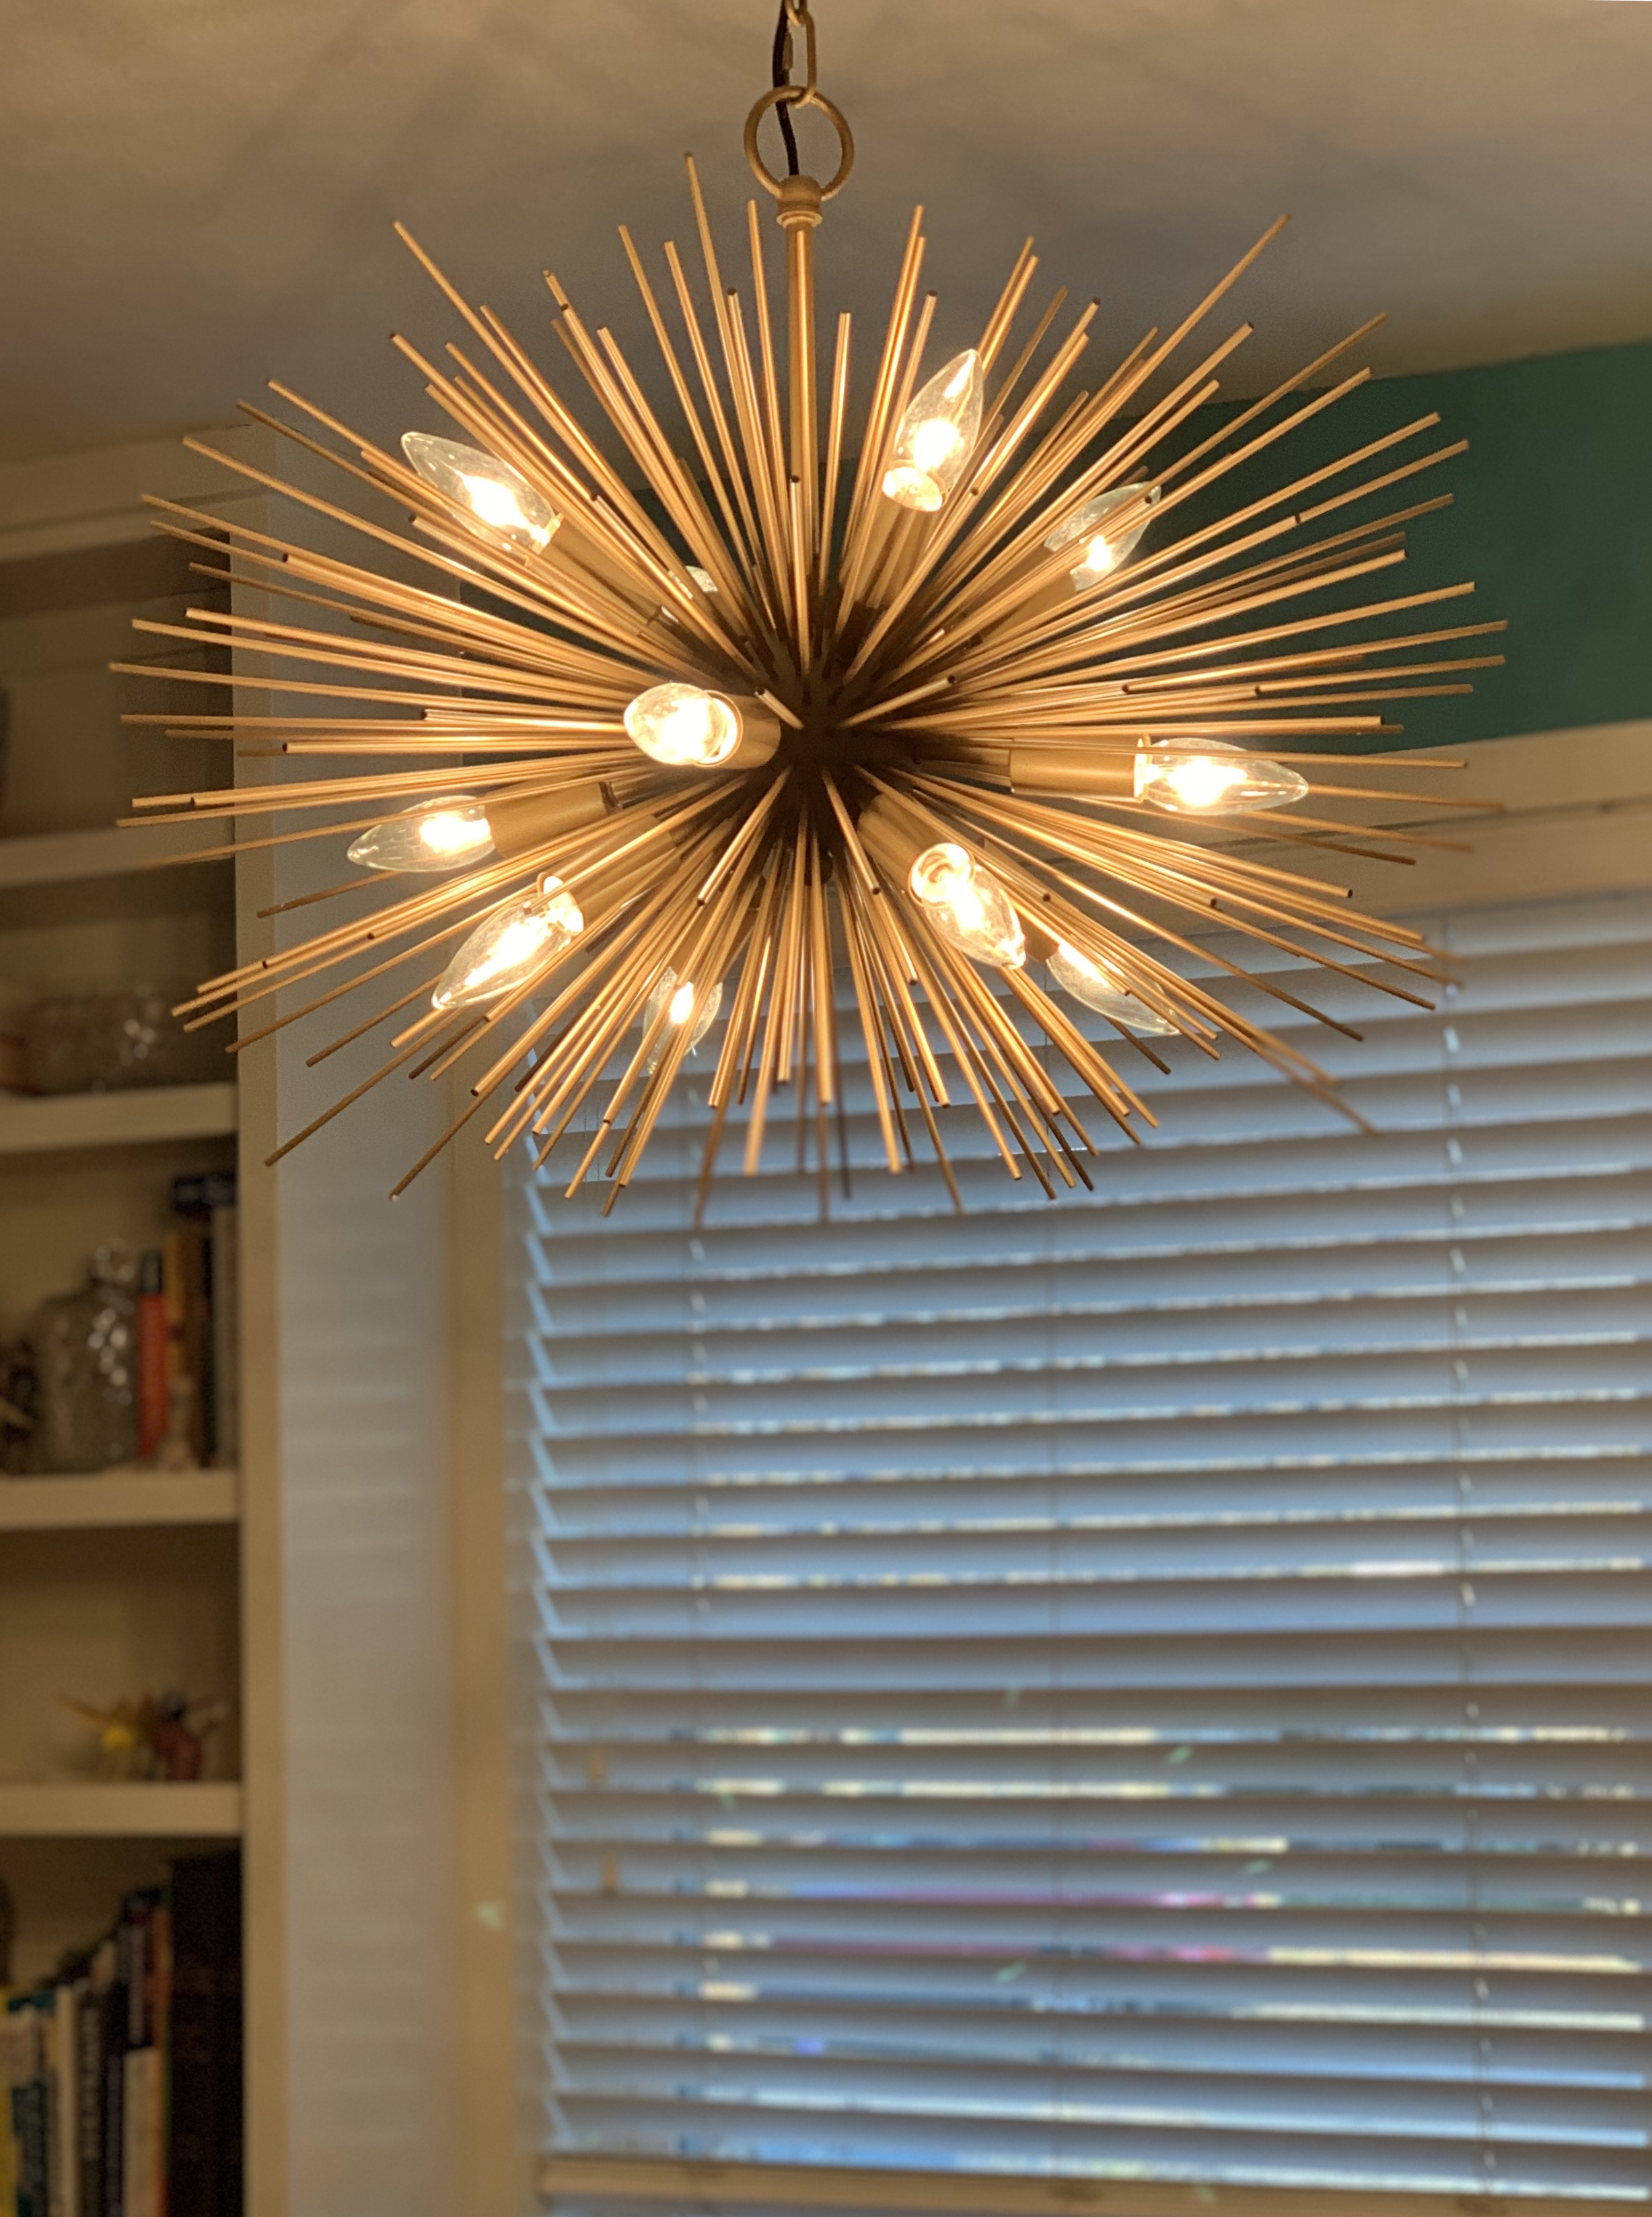 Merry Christmas To Me! | Piece O Cake Blog throughout Johanne 6-Light Sputnik Chandeliers (Image 20 of 30)